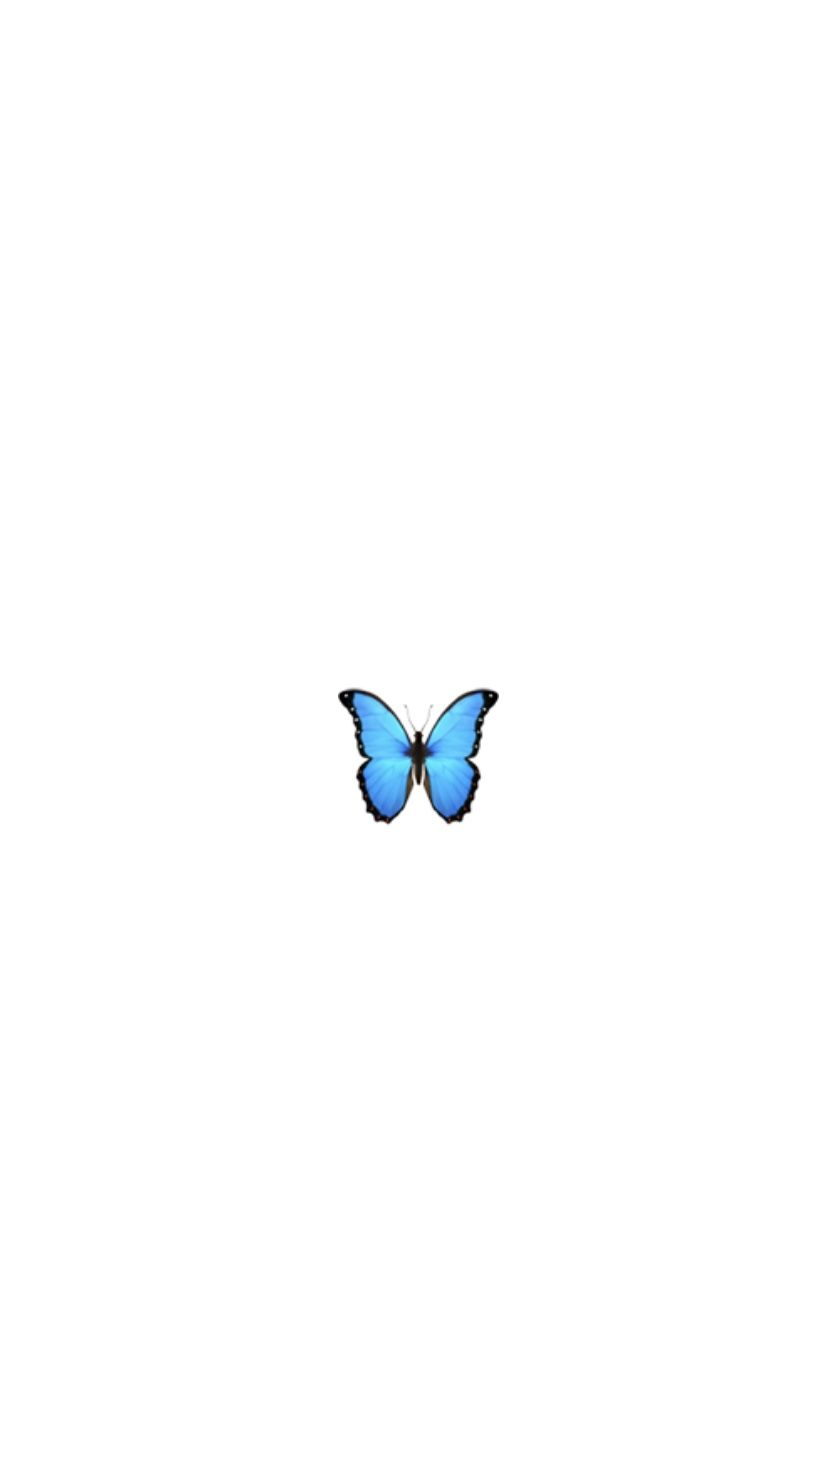 Fond Ecran Papillon Emoji